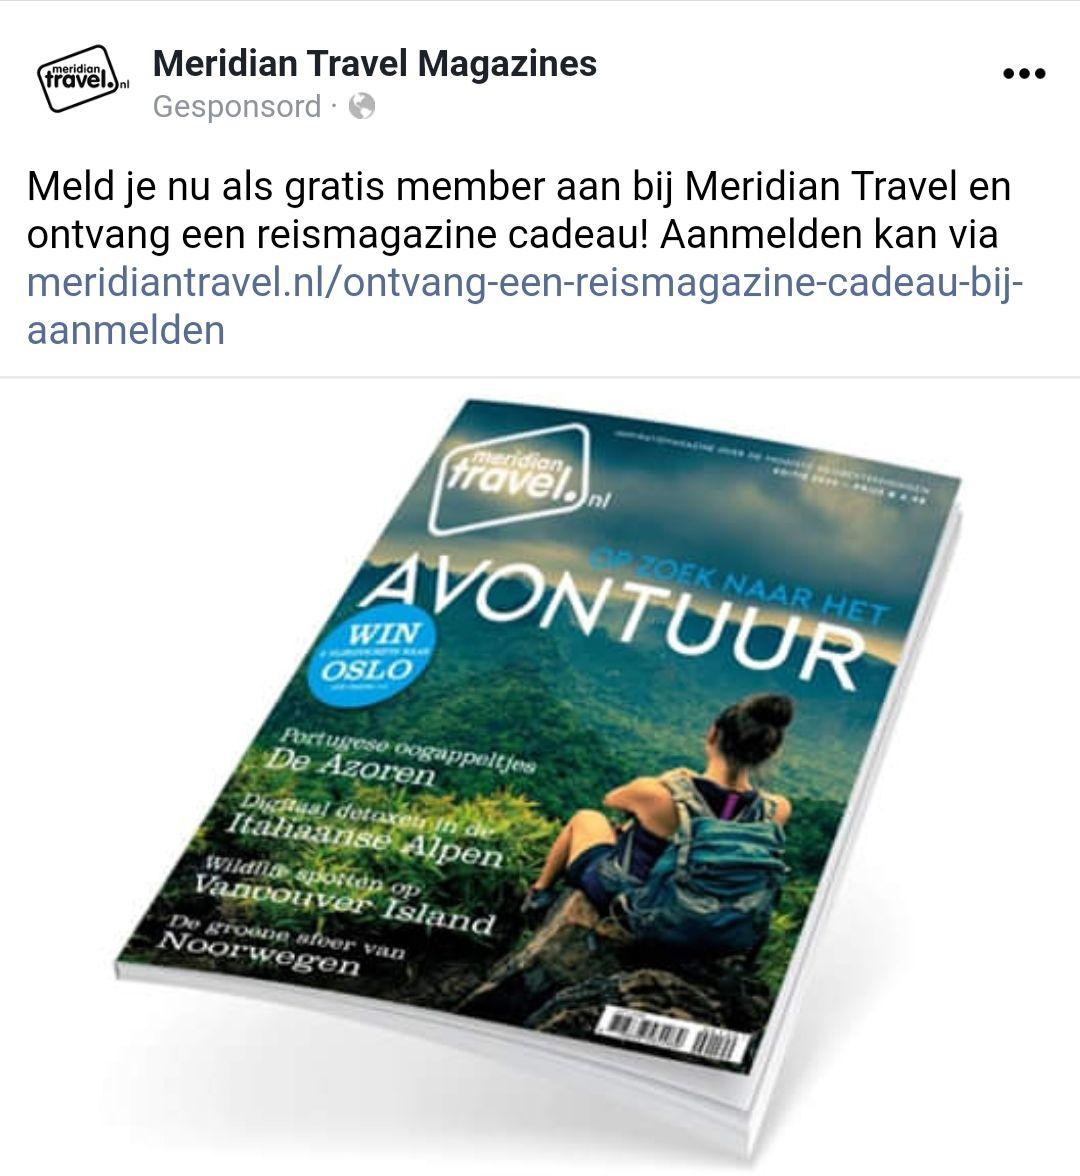 Gratis reismagazine Meridian Travel